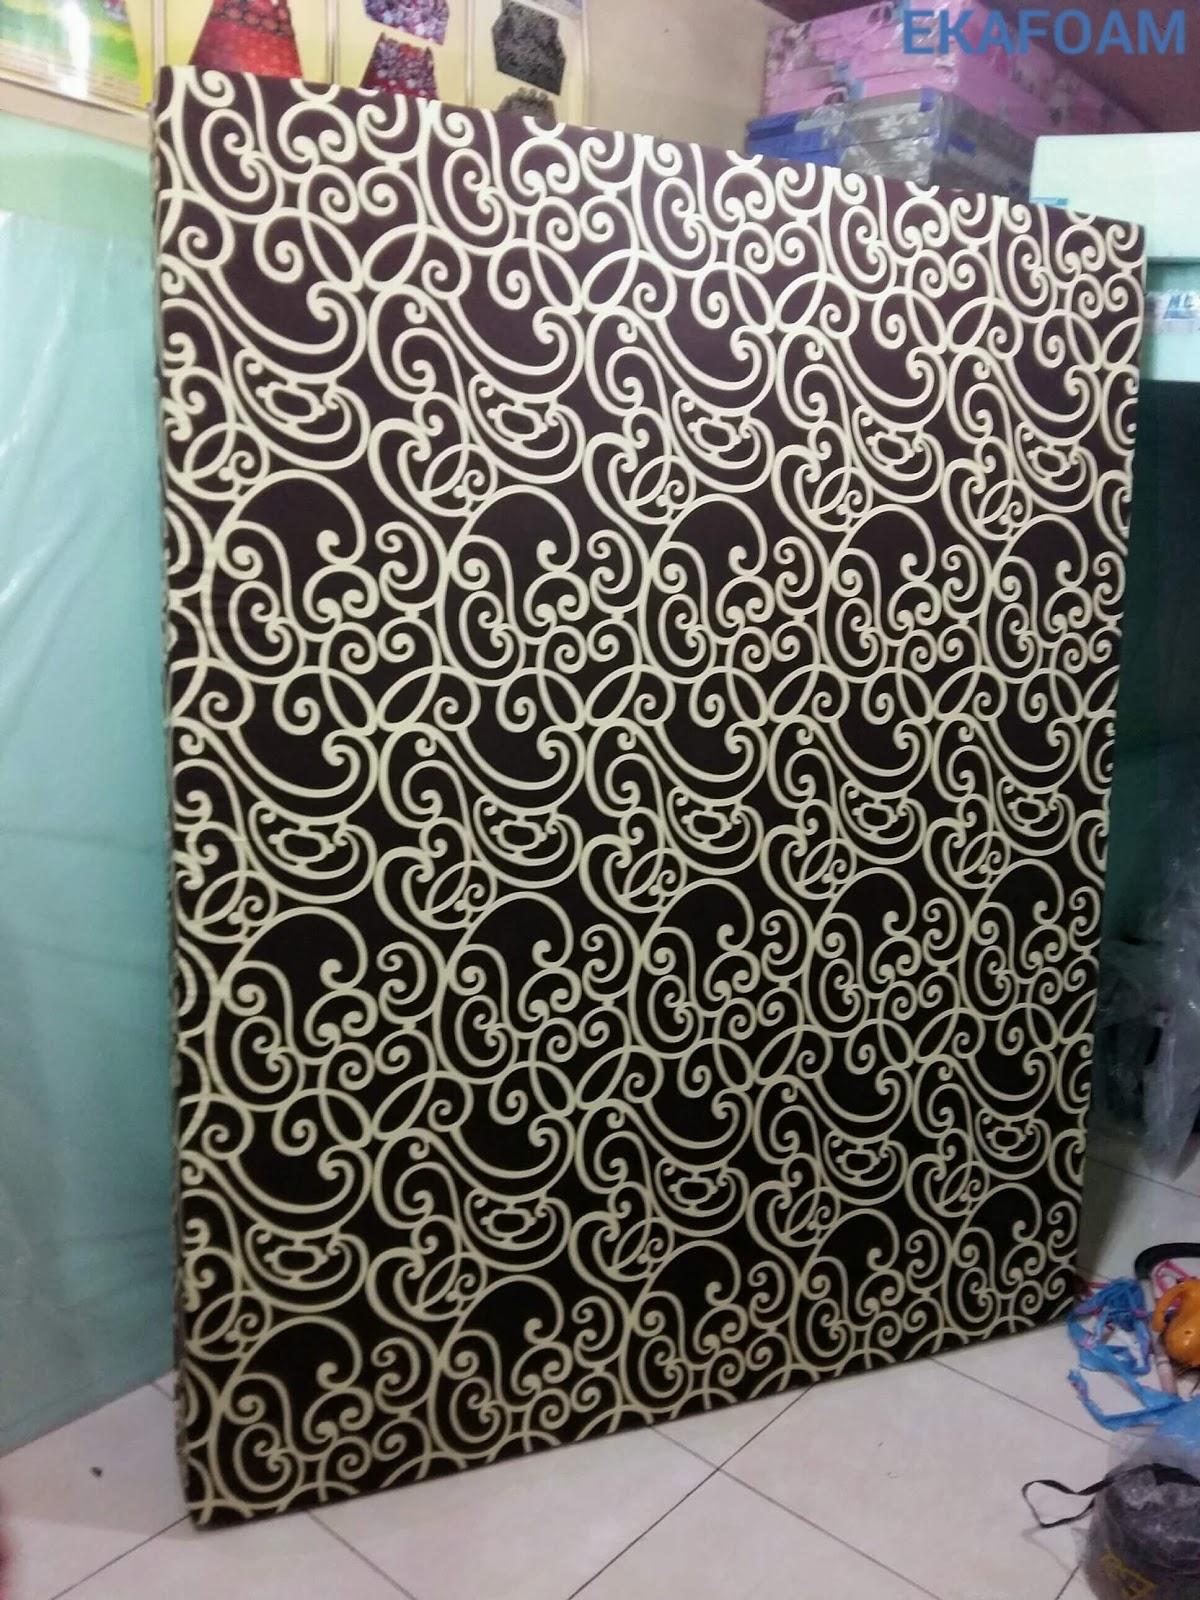 Harga Sofa Bed Inoac 2017 Very Large Back Cushions Kasur Terbaru Agen Busa